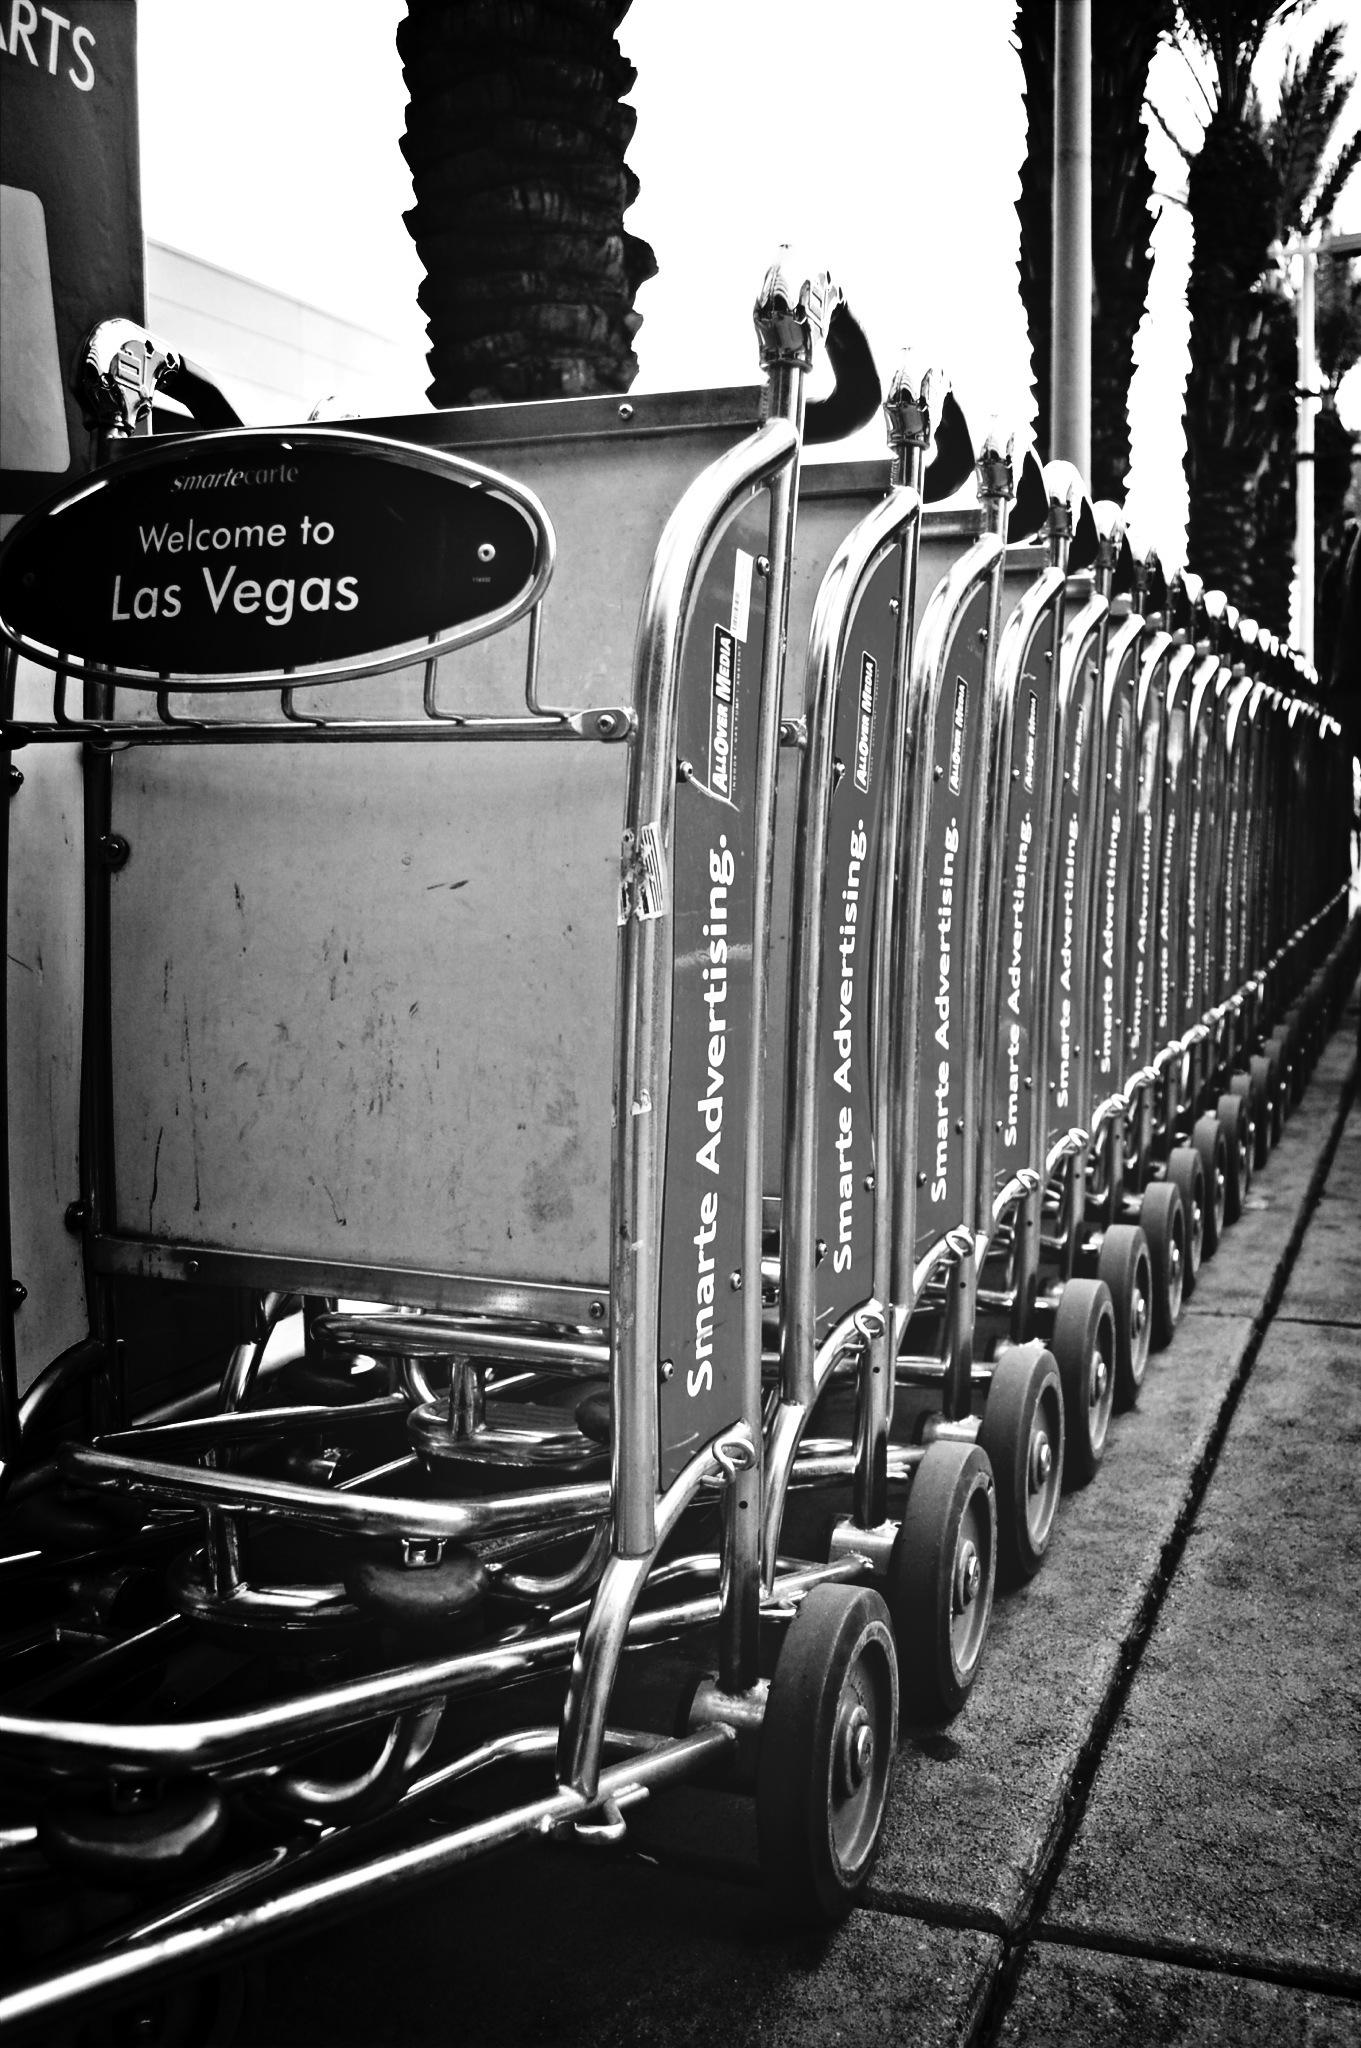 Rhythm of the cart